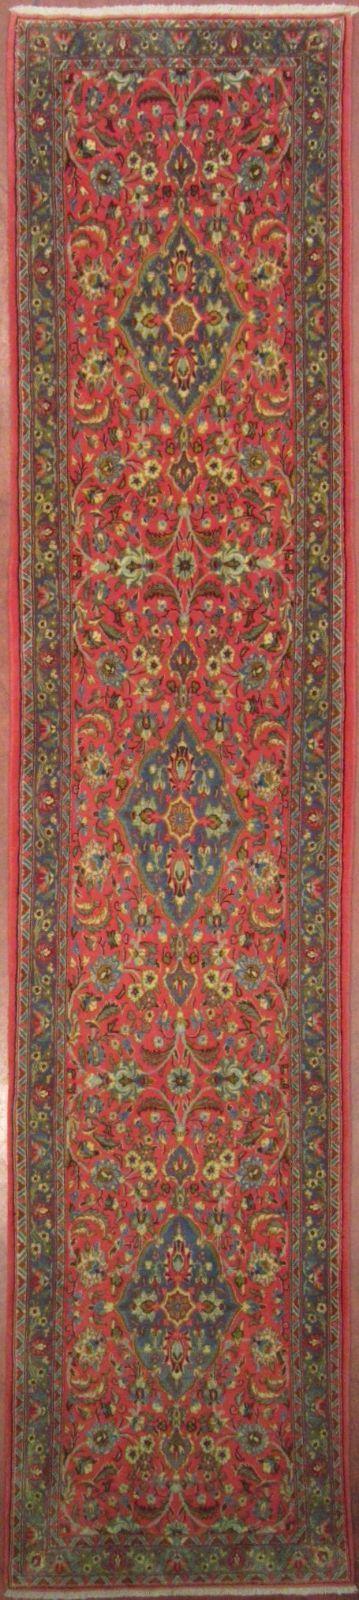 N. 347648 – QUM 380 X 83 cm. – Tappeti Orientali e Moderni Vendita ...